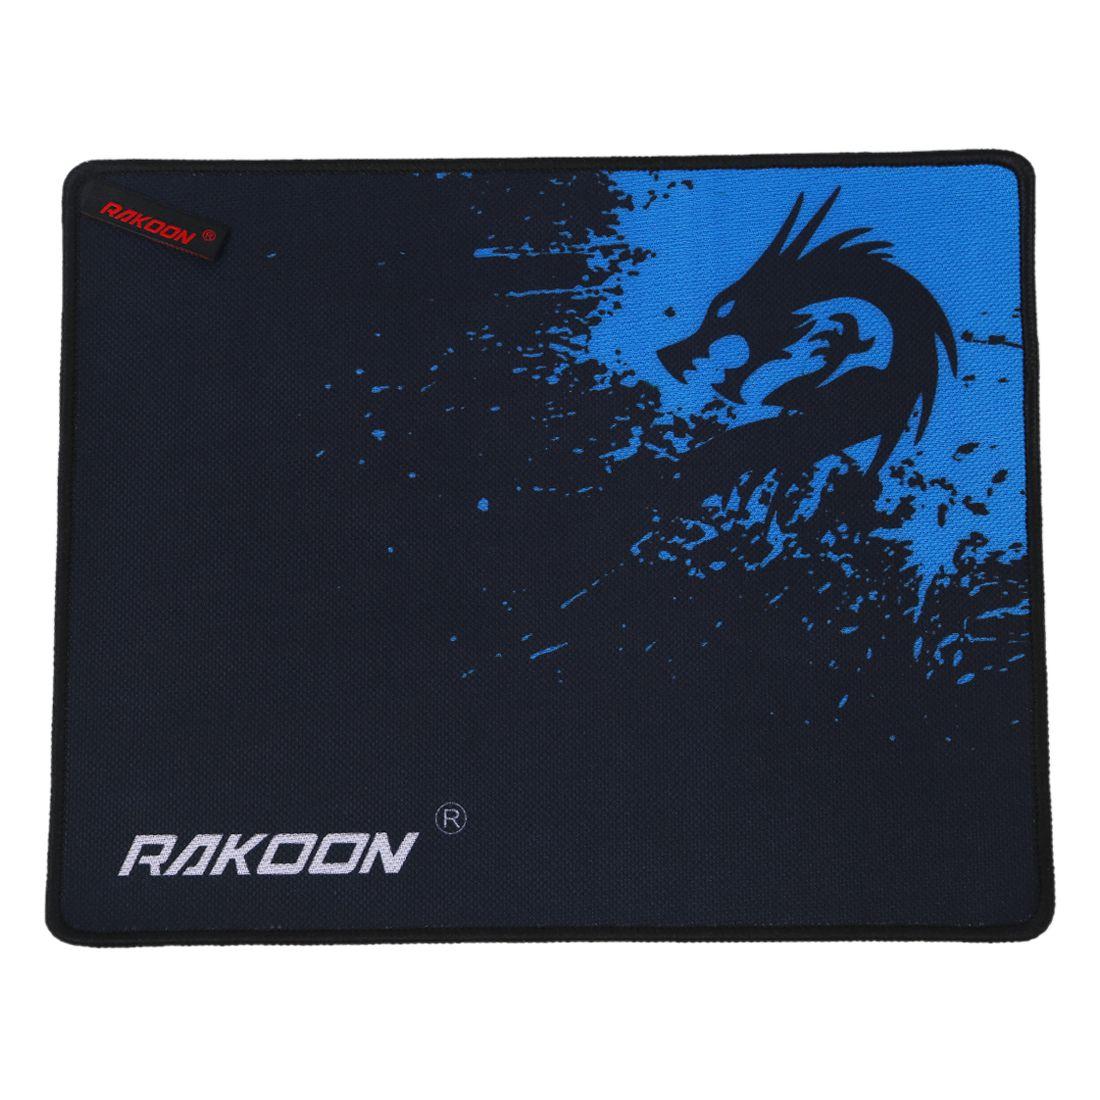 Alfombrilla de ratón RAKOON Xinlong de gran Alfombrilla de ratón grande con cierre de borde para juegos para Barra de Internet (Control azul 25*30 CM)